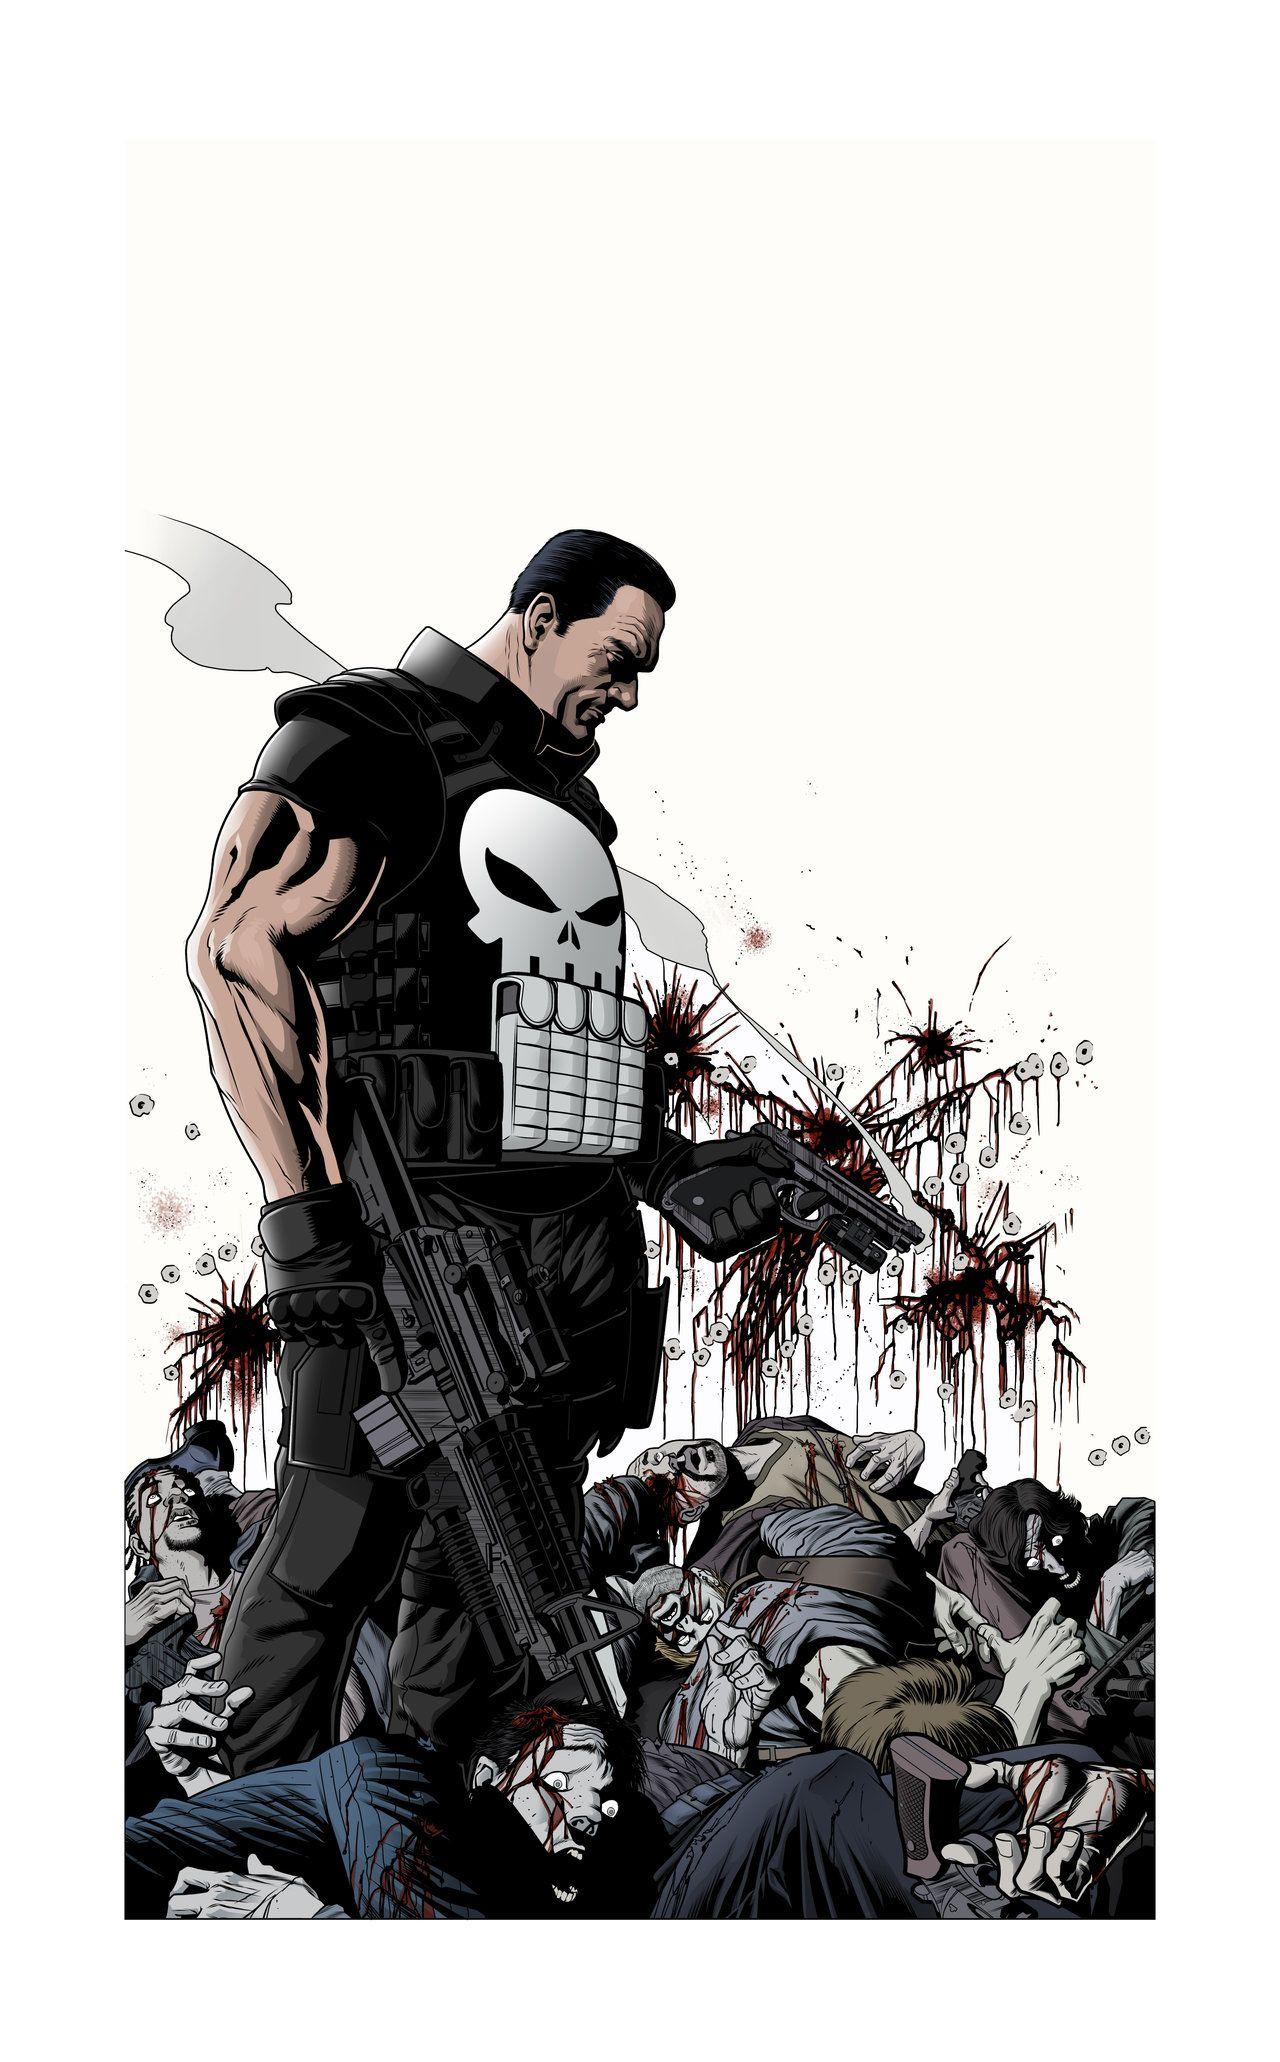 Pin de Harold Espinosa en The Punisher Cómics